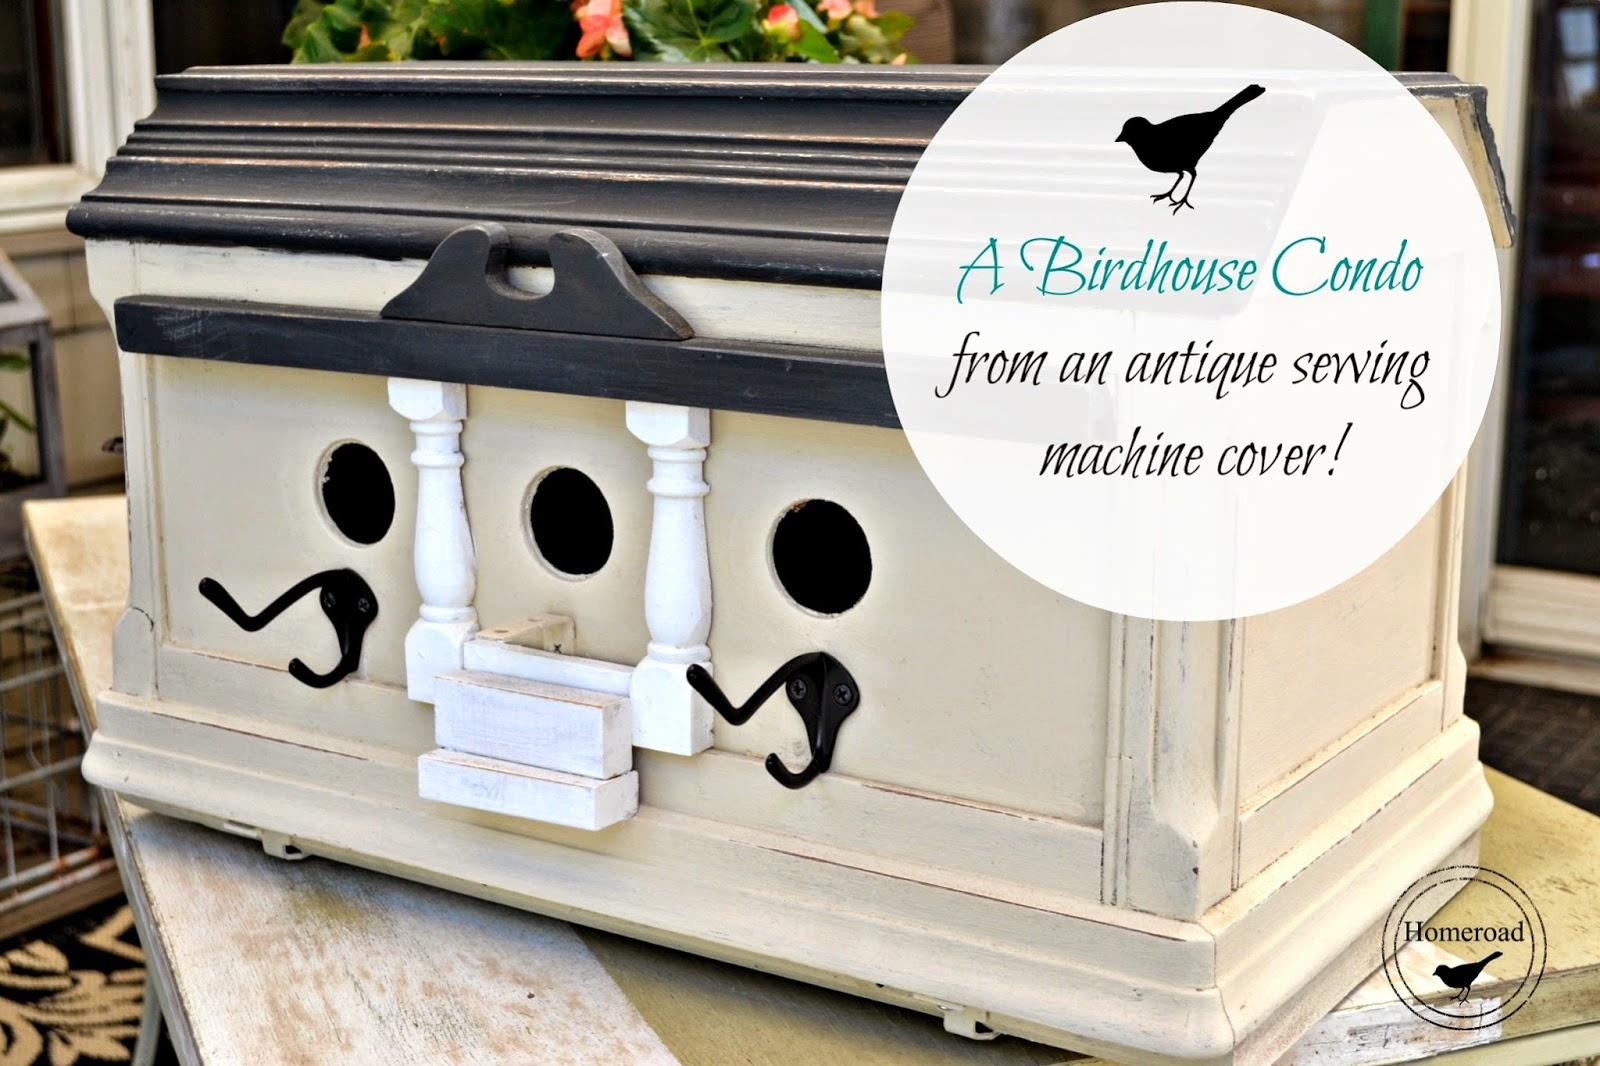 A Repurposed Birdhouse Condo www.homeroad.net